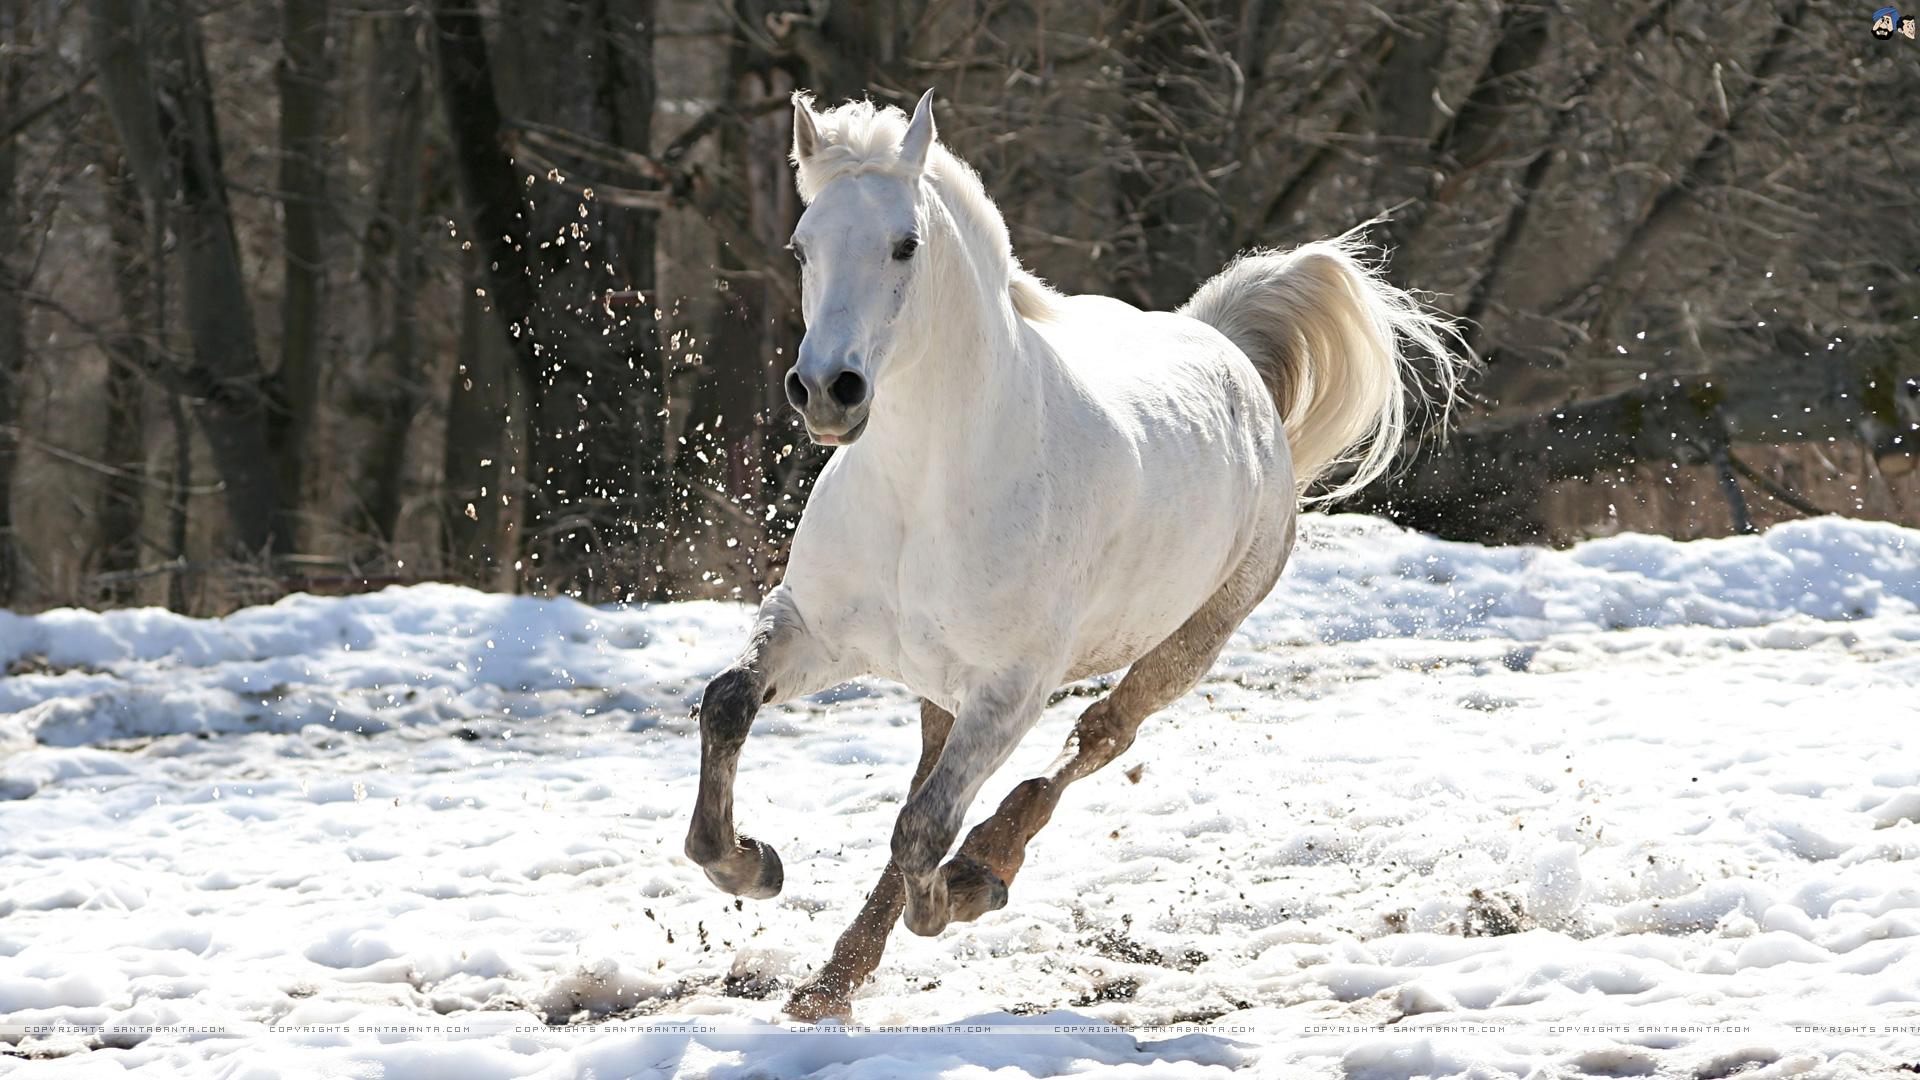 Free Download Horse Wallpaper Horse Wallpapers Desktop Backgrounds